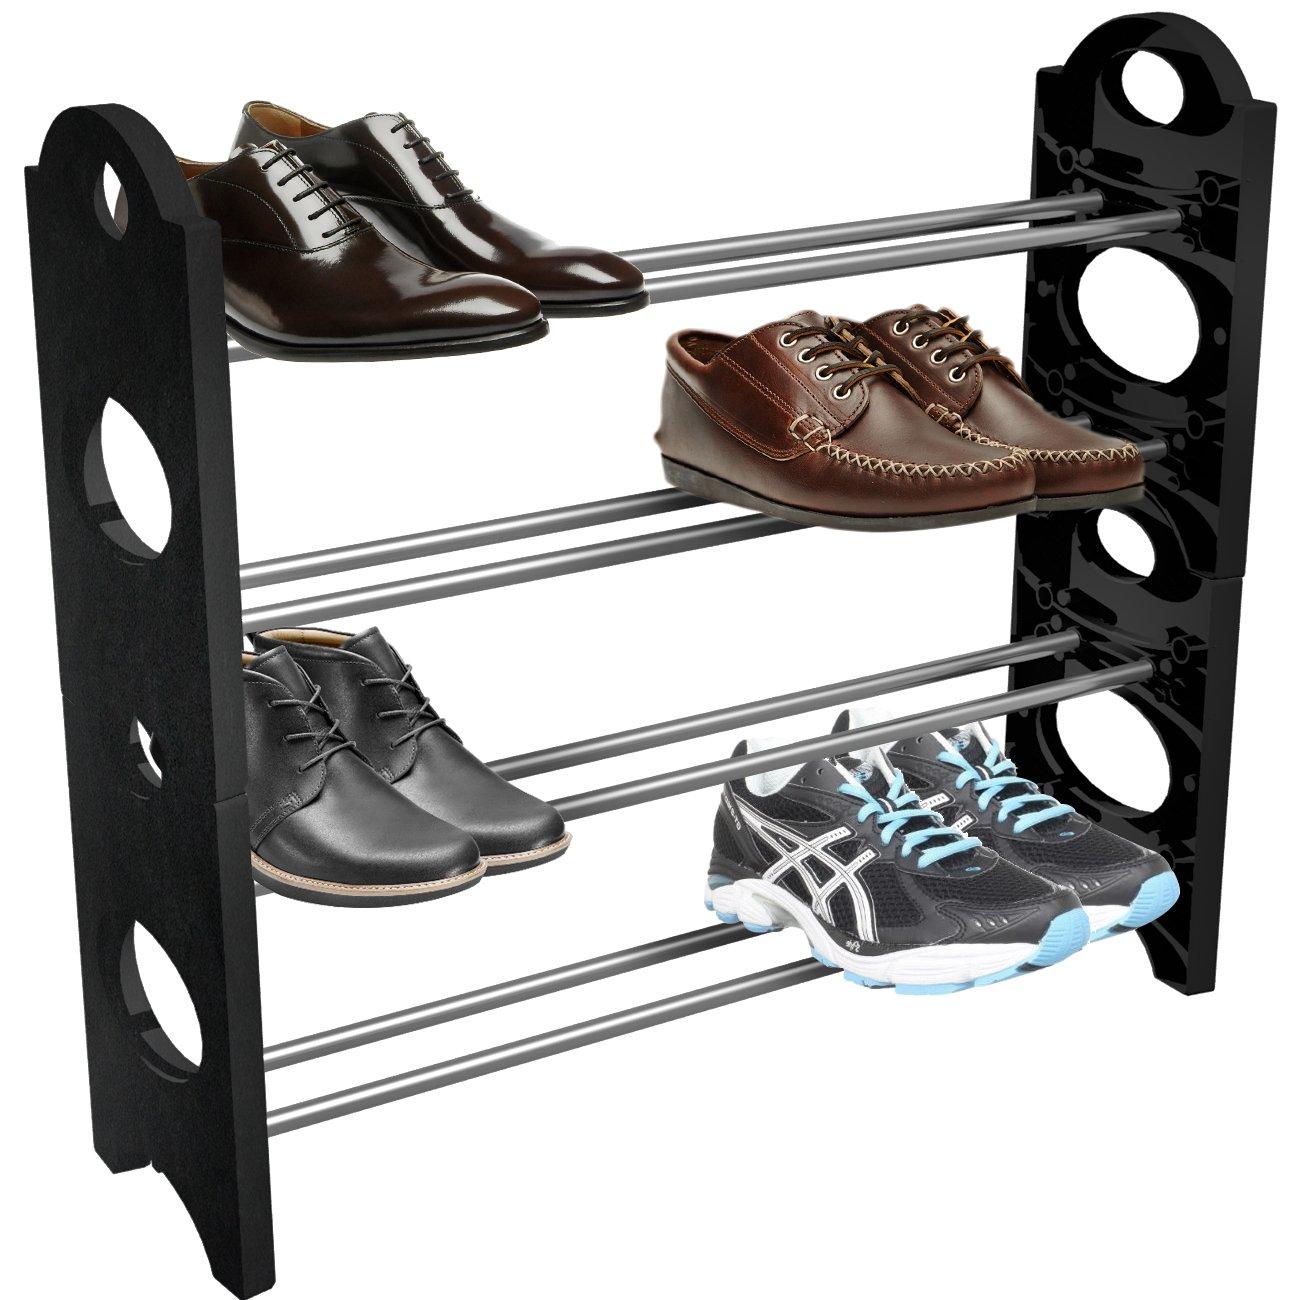 Sorbus Shoe Rack Organizer- 20 Pairs, Black